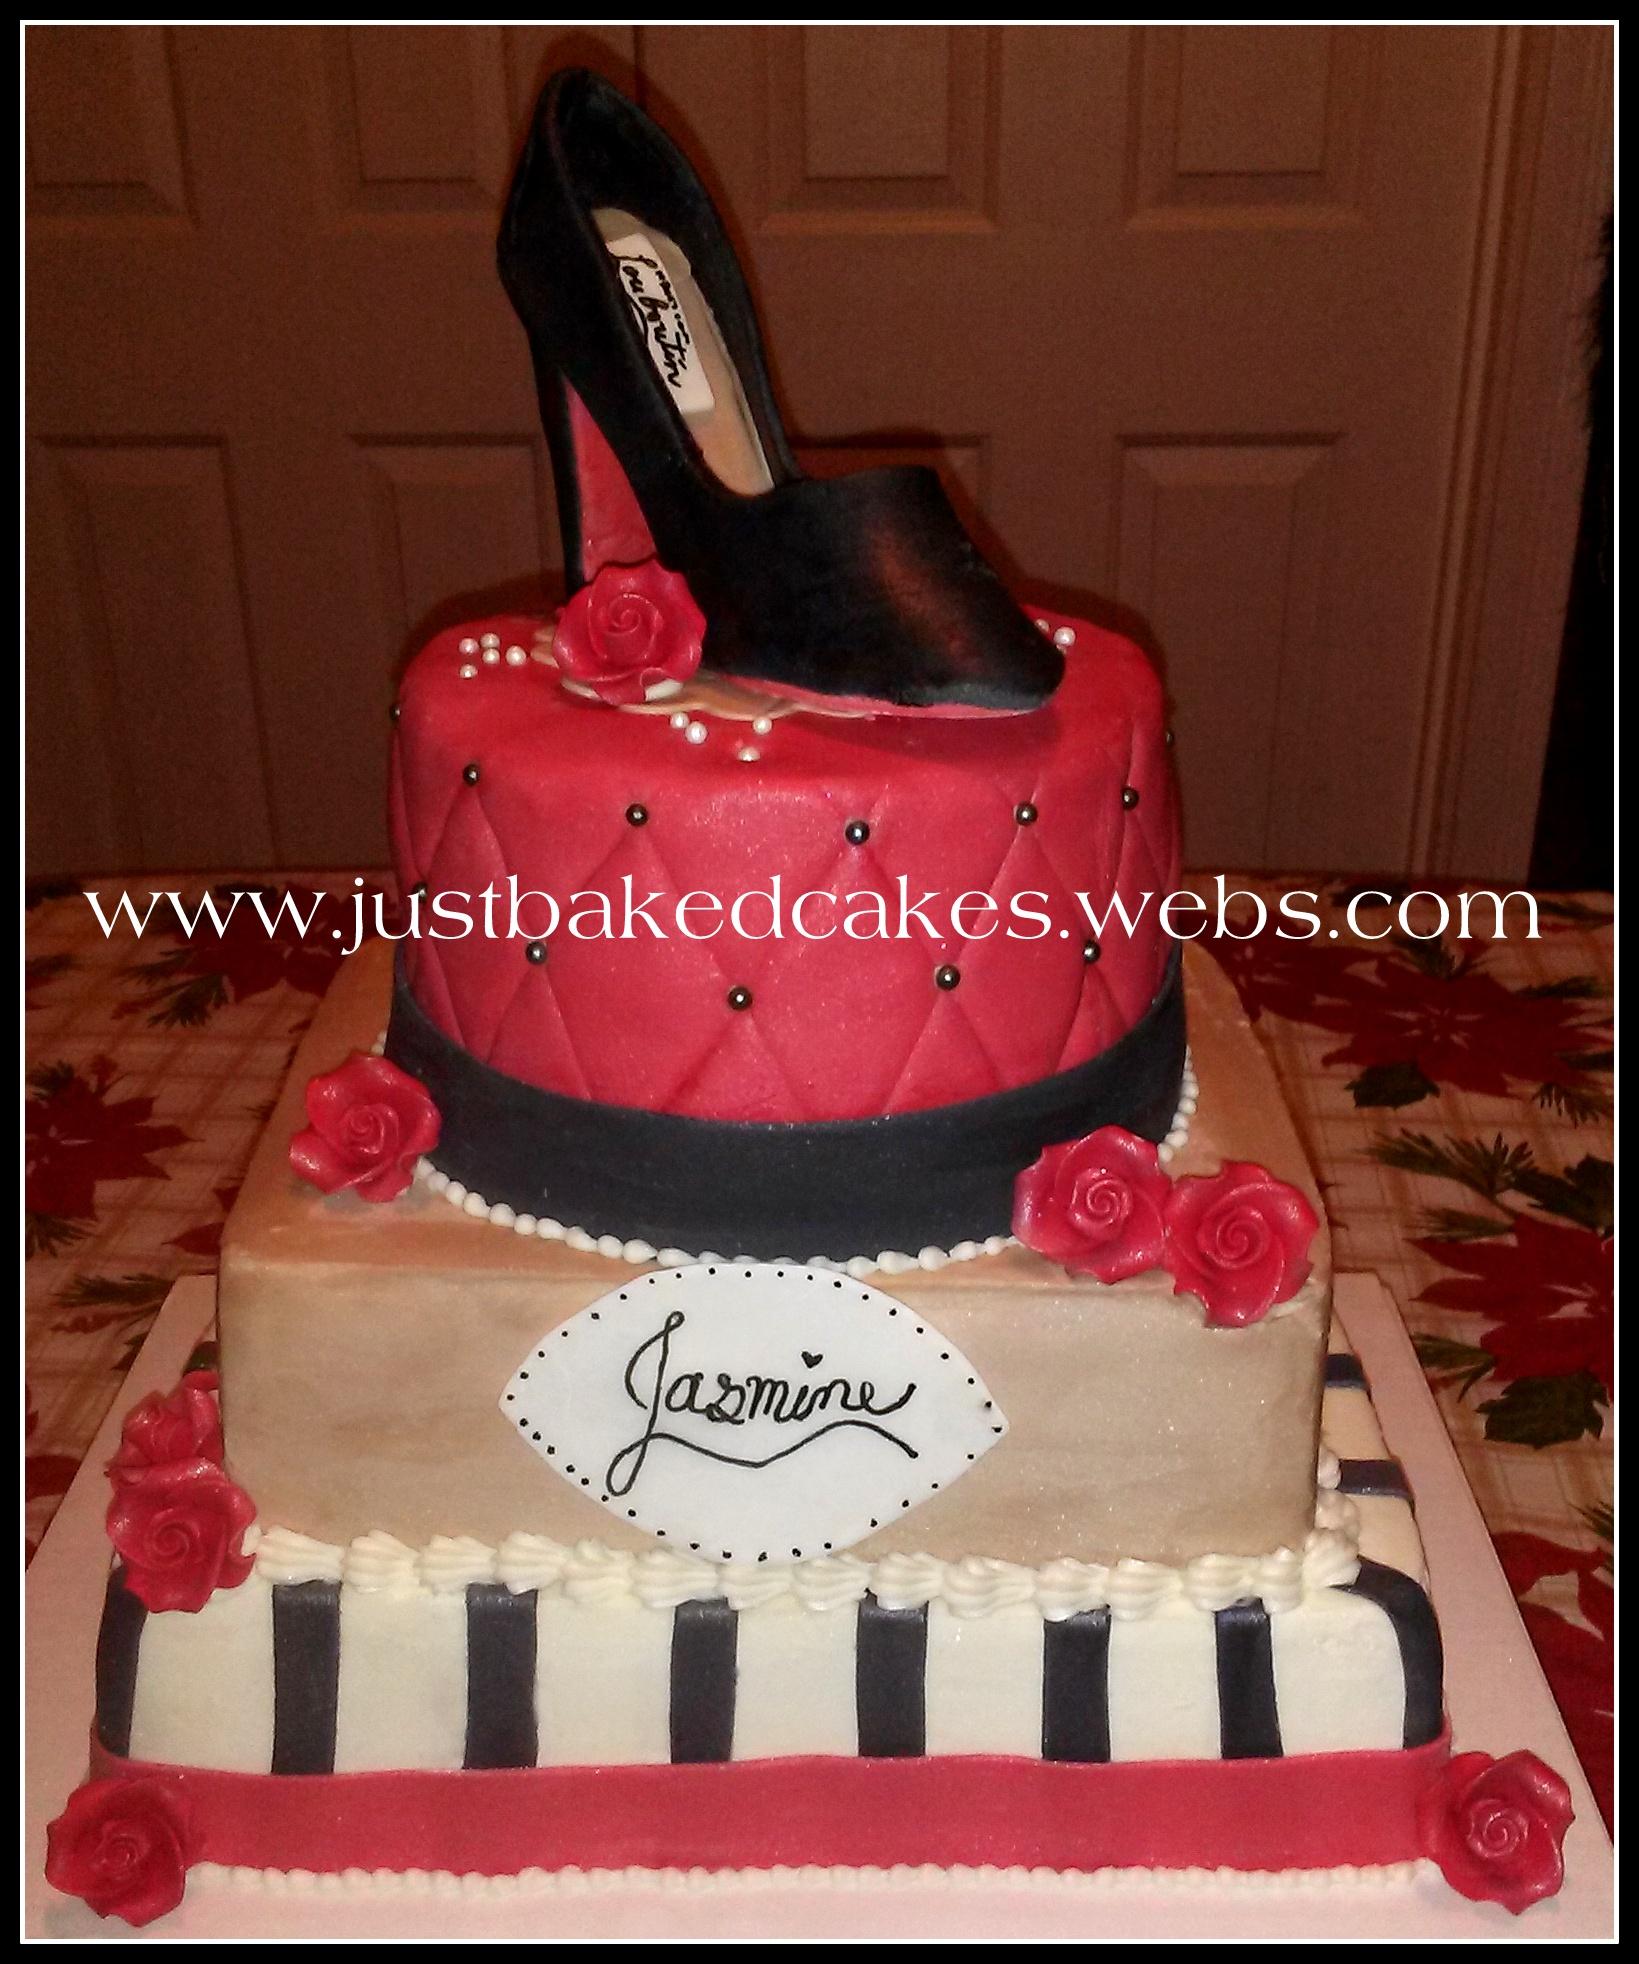 High heel shaped cake